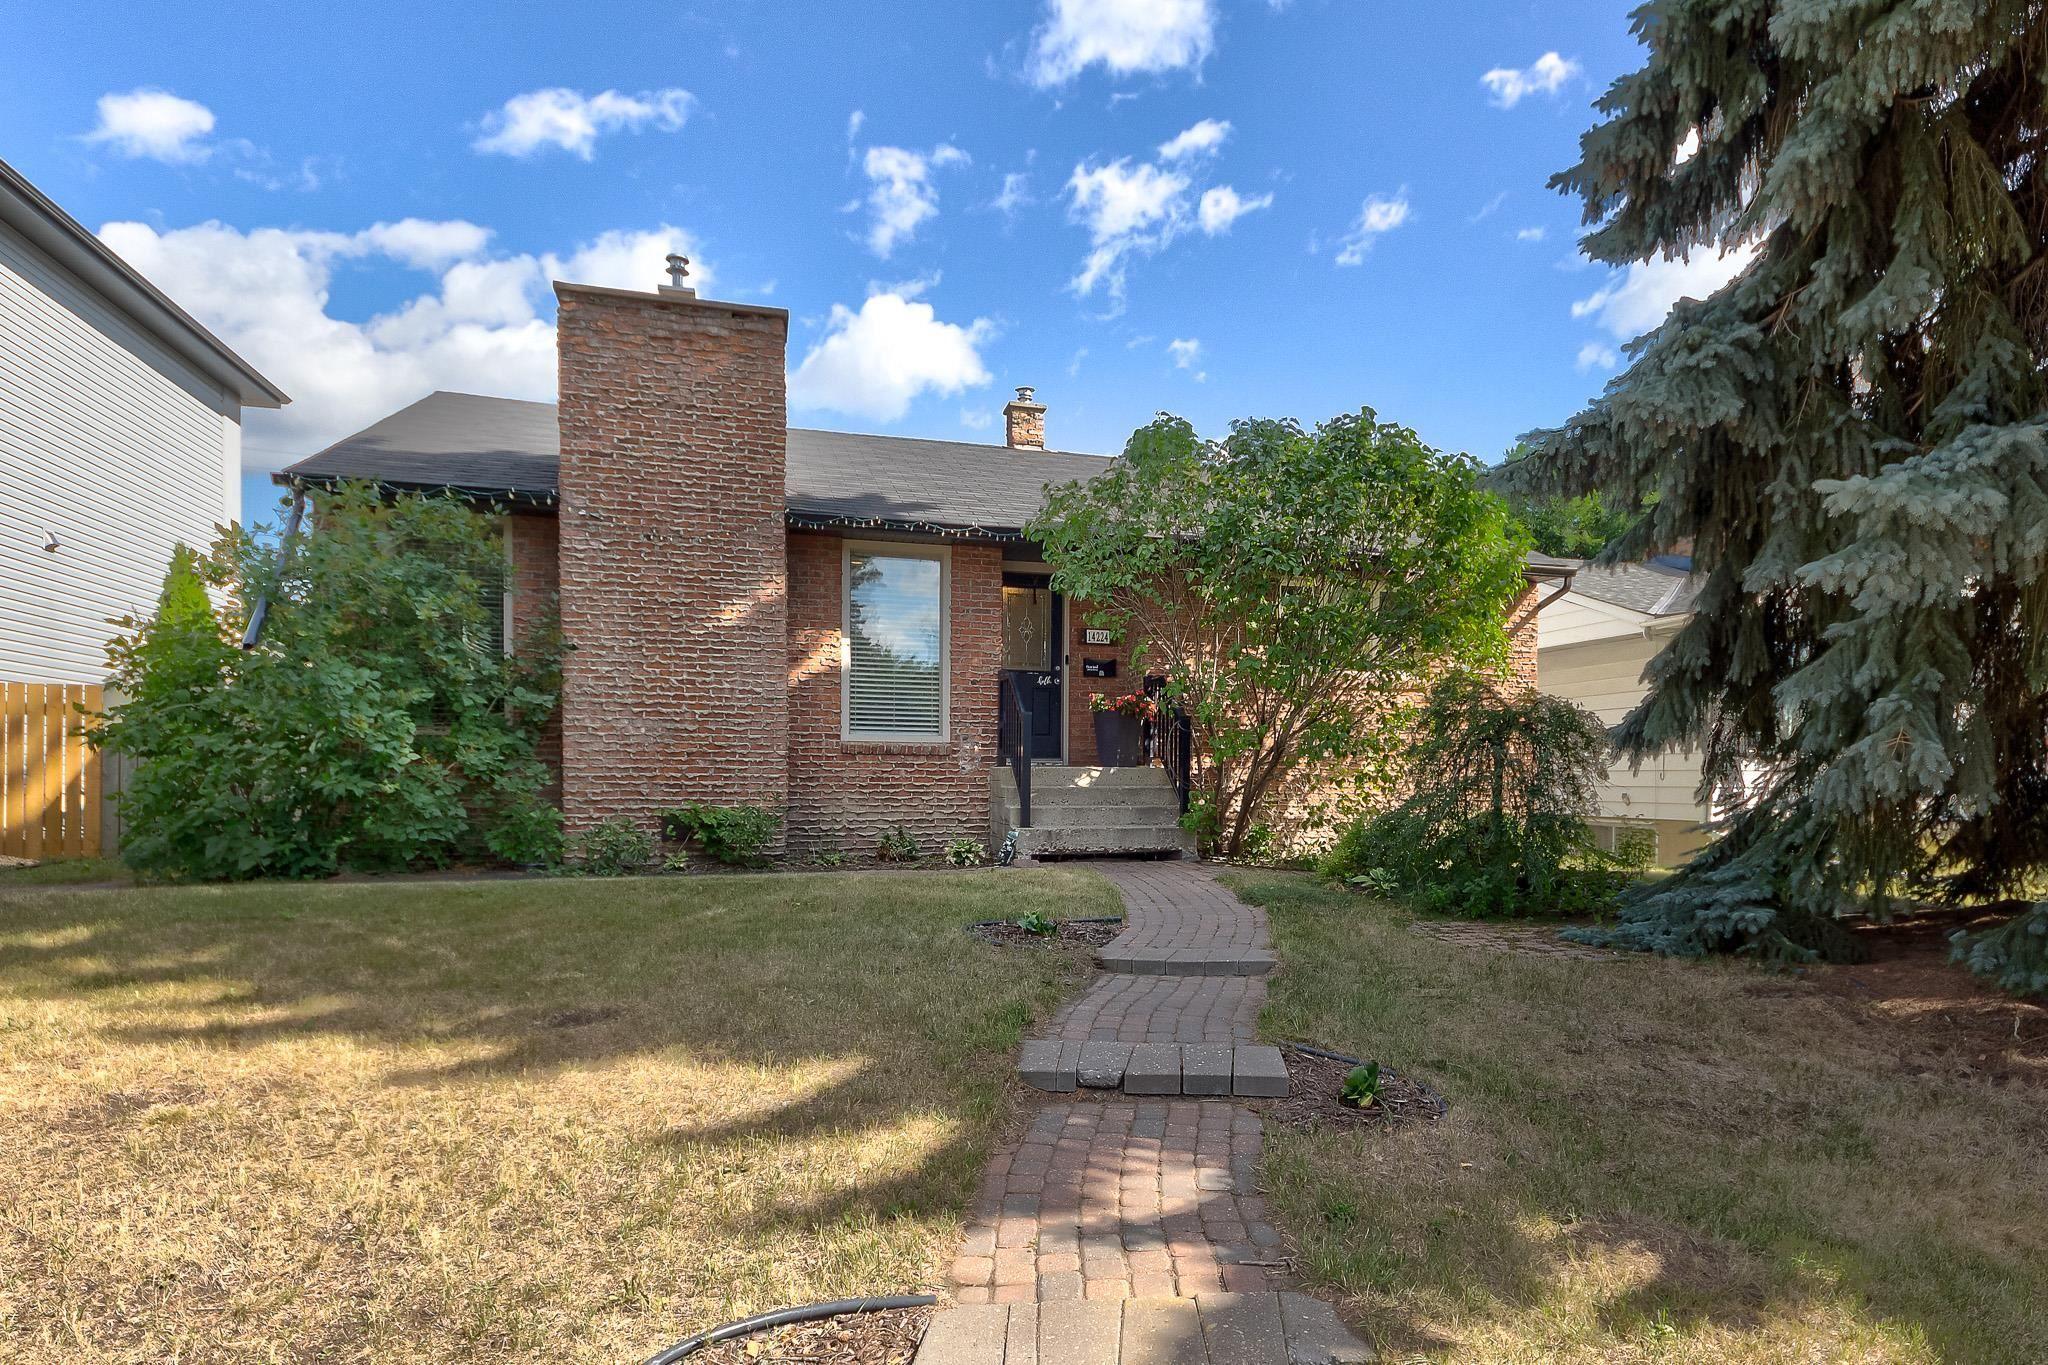 Main Photo: 14224 95 Avenue in Edmonton: Zone 10 House for sale : MLS®# E4259113